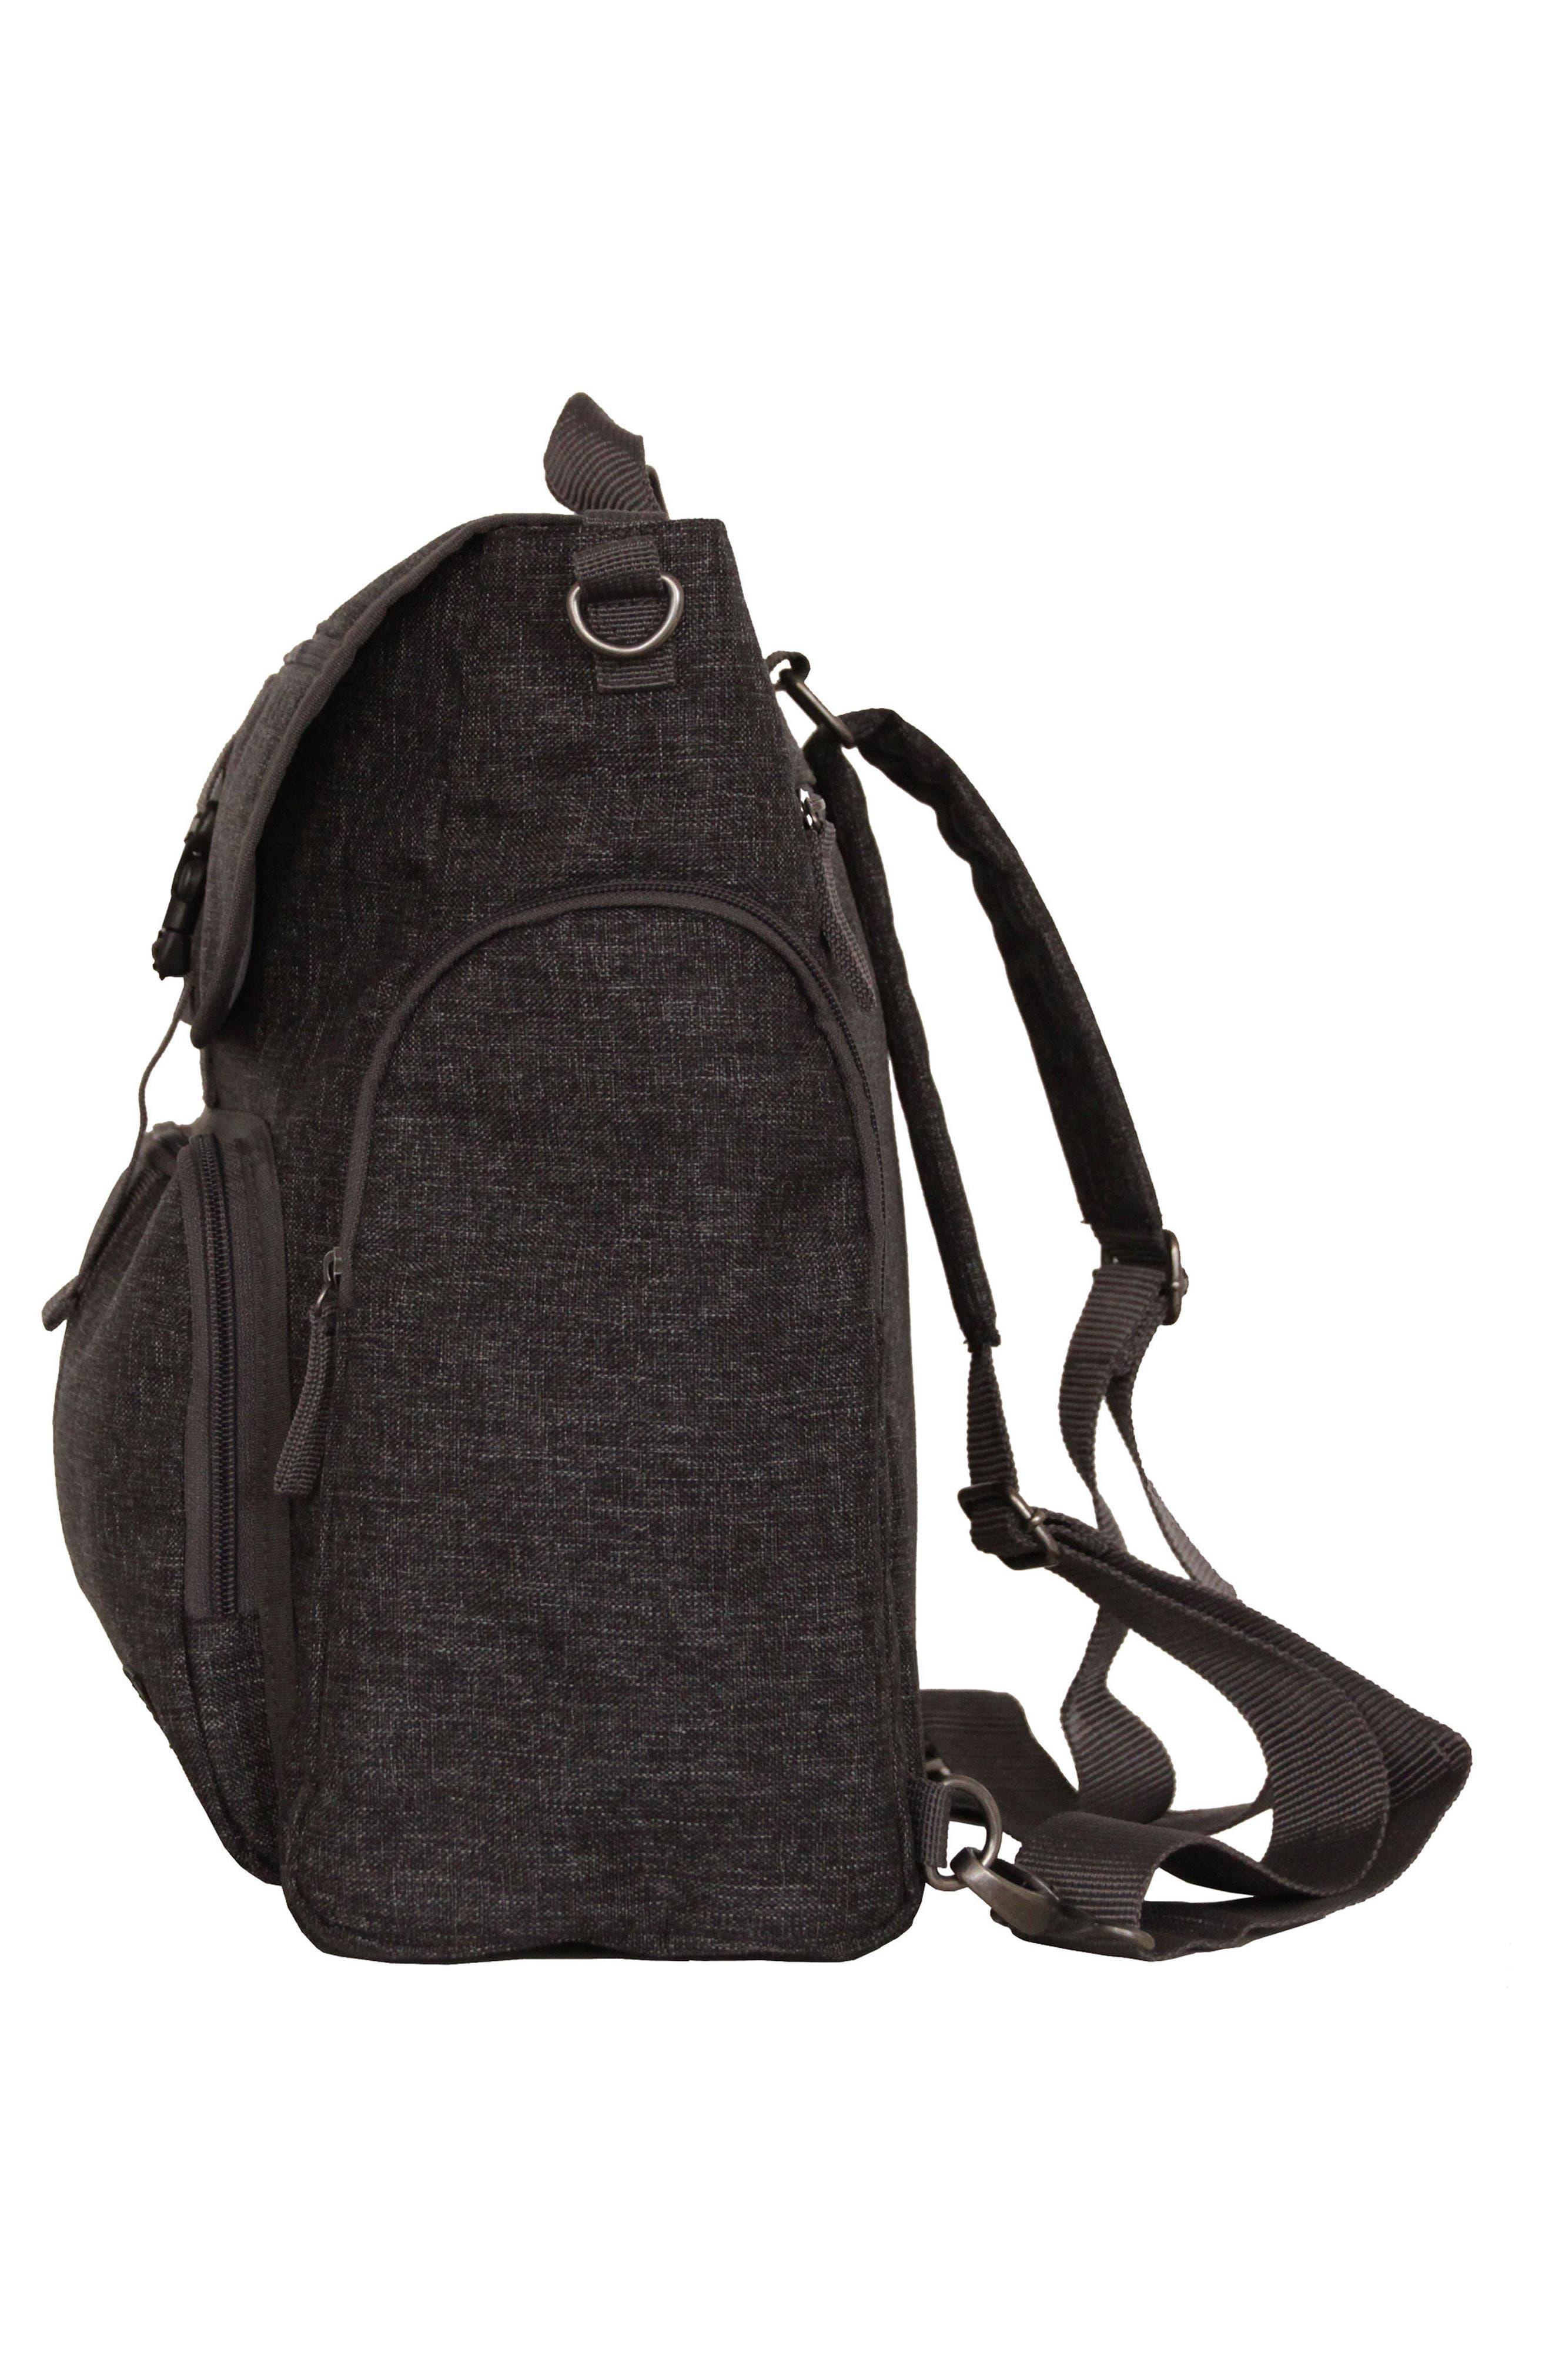 Convertible Diaper Backpack,                             Alternate thumbnail 5, color,                             001